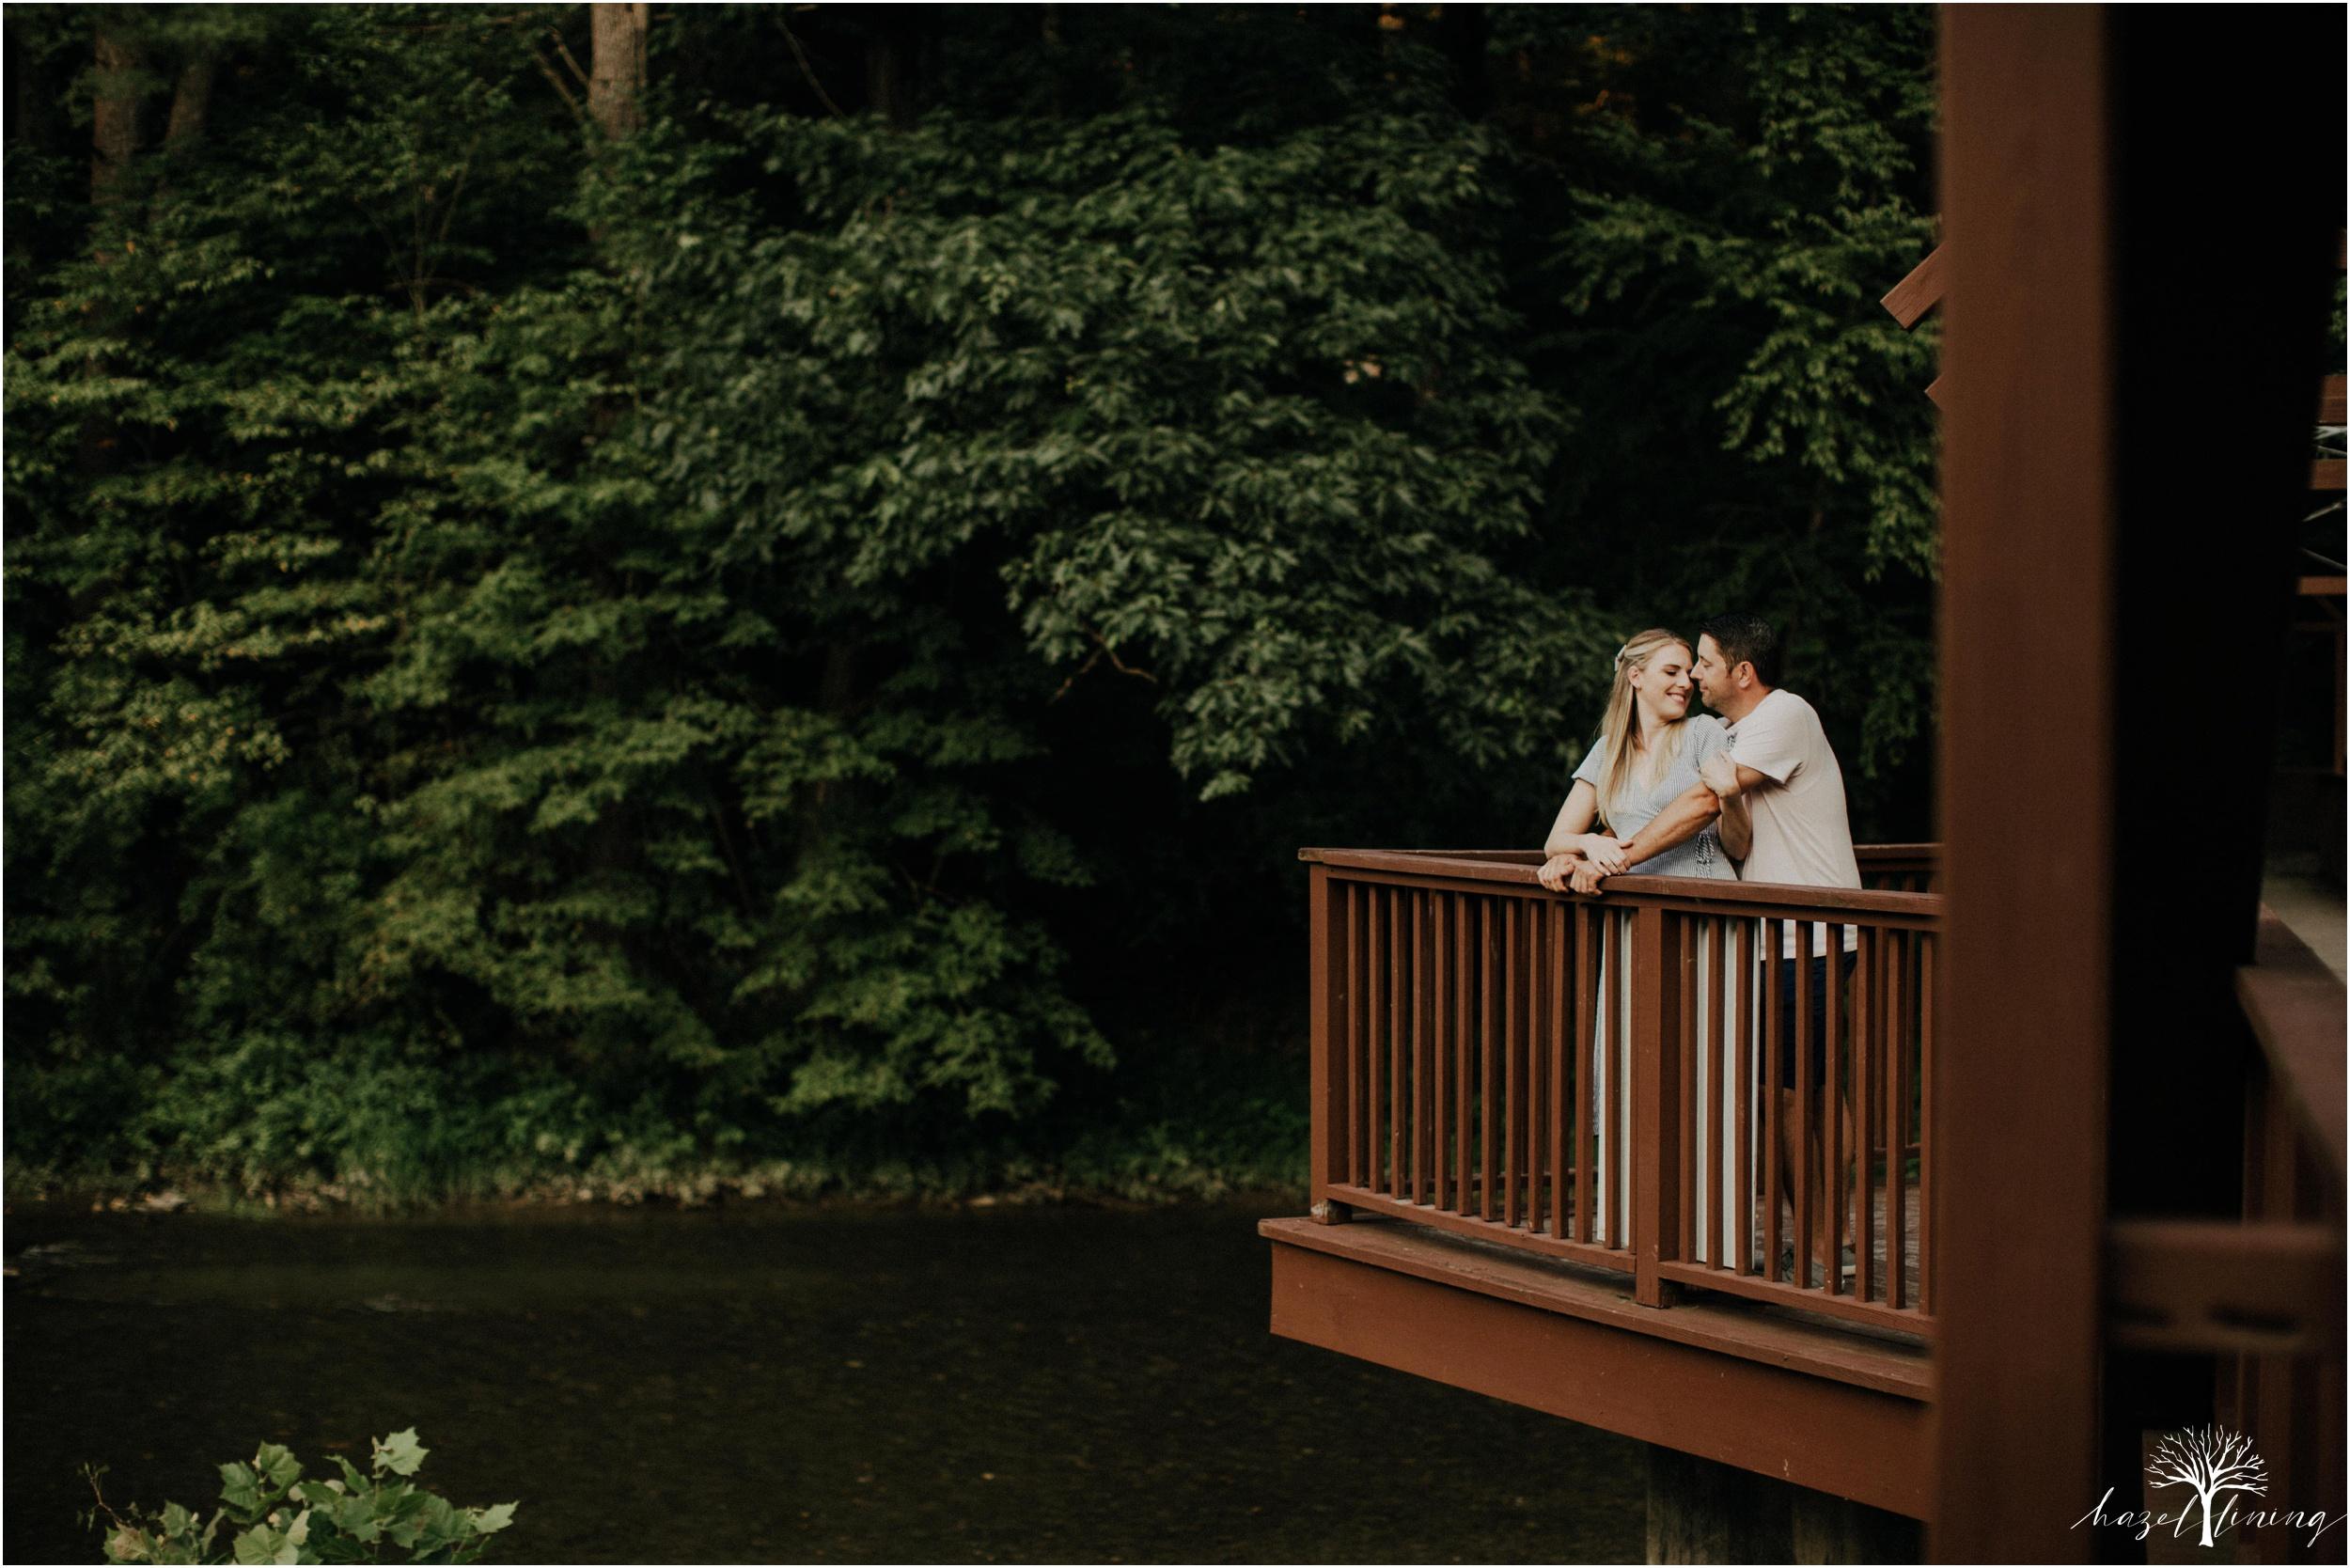 ashley-fillmore-steve-reimer-trexler-nature-preserve-summer-engagement-session-schnecksville-pennsylvania-hazel-lining-photography-destination-elopement-wedding-engagement-photography_0016.jpg